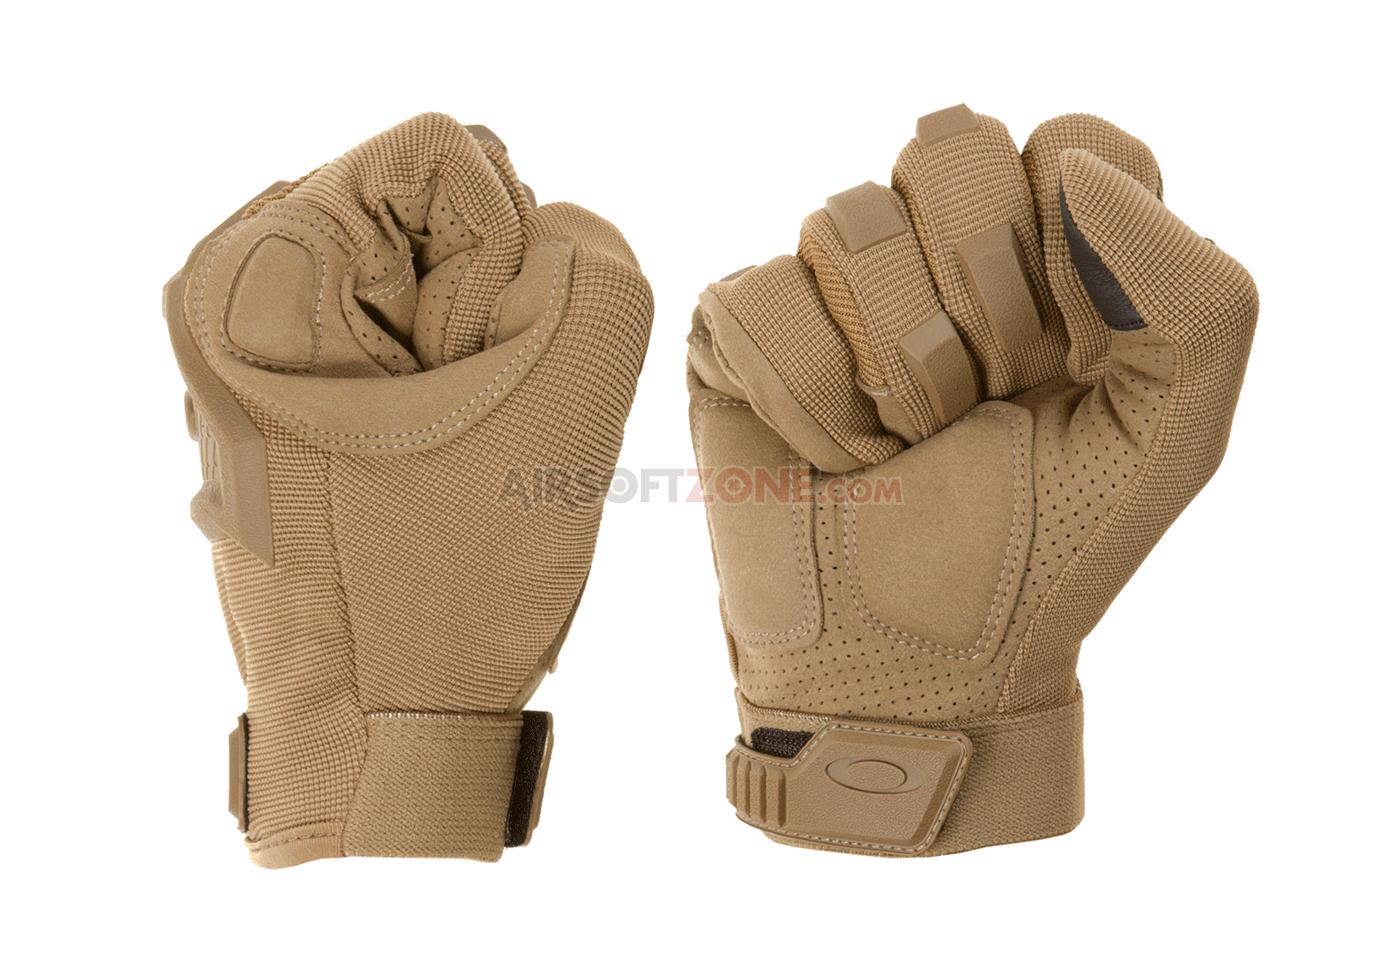 97a324a0009 SI Flexion Gloves Coyote (Oakley) XL - Gloves - Garments - airsoftzone.com  Online shop